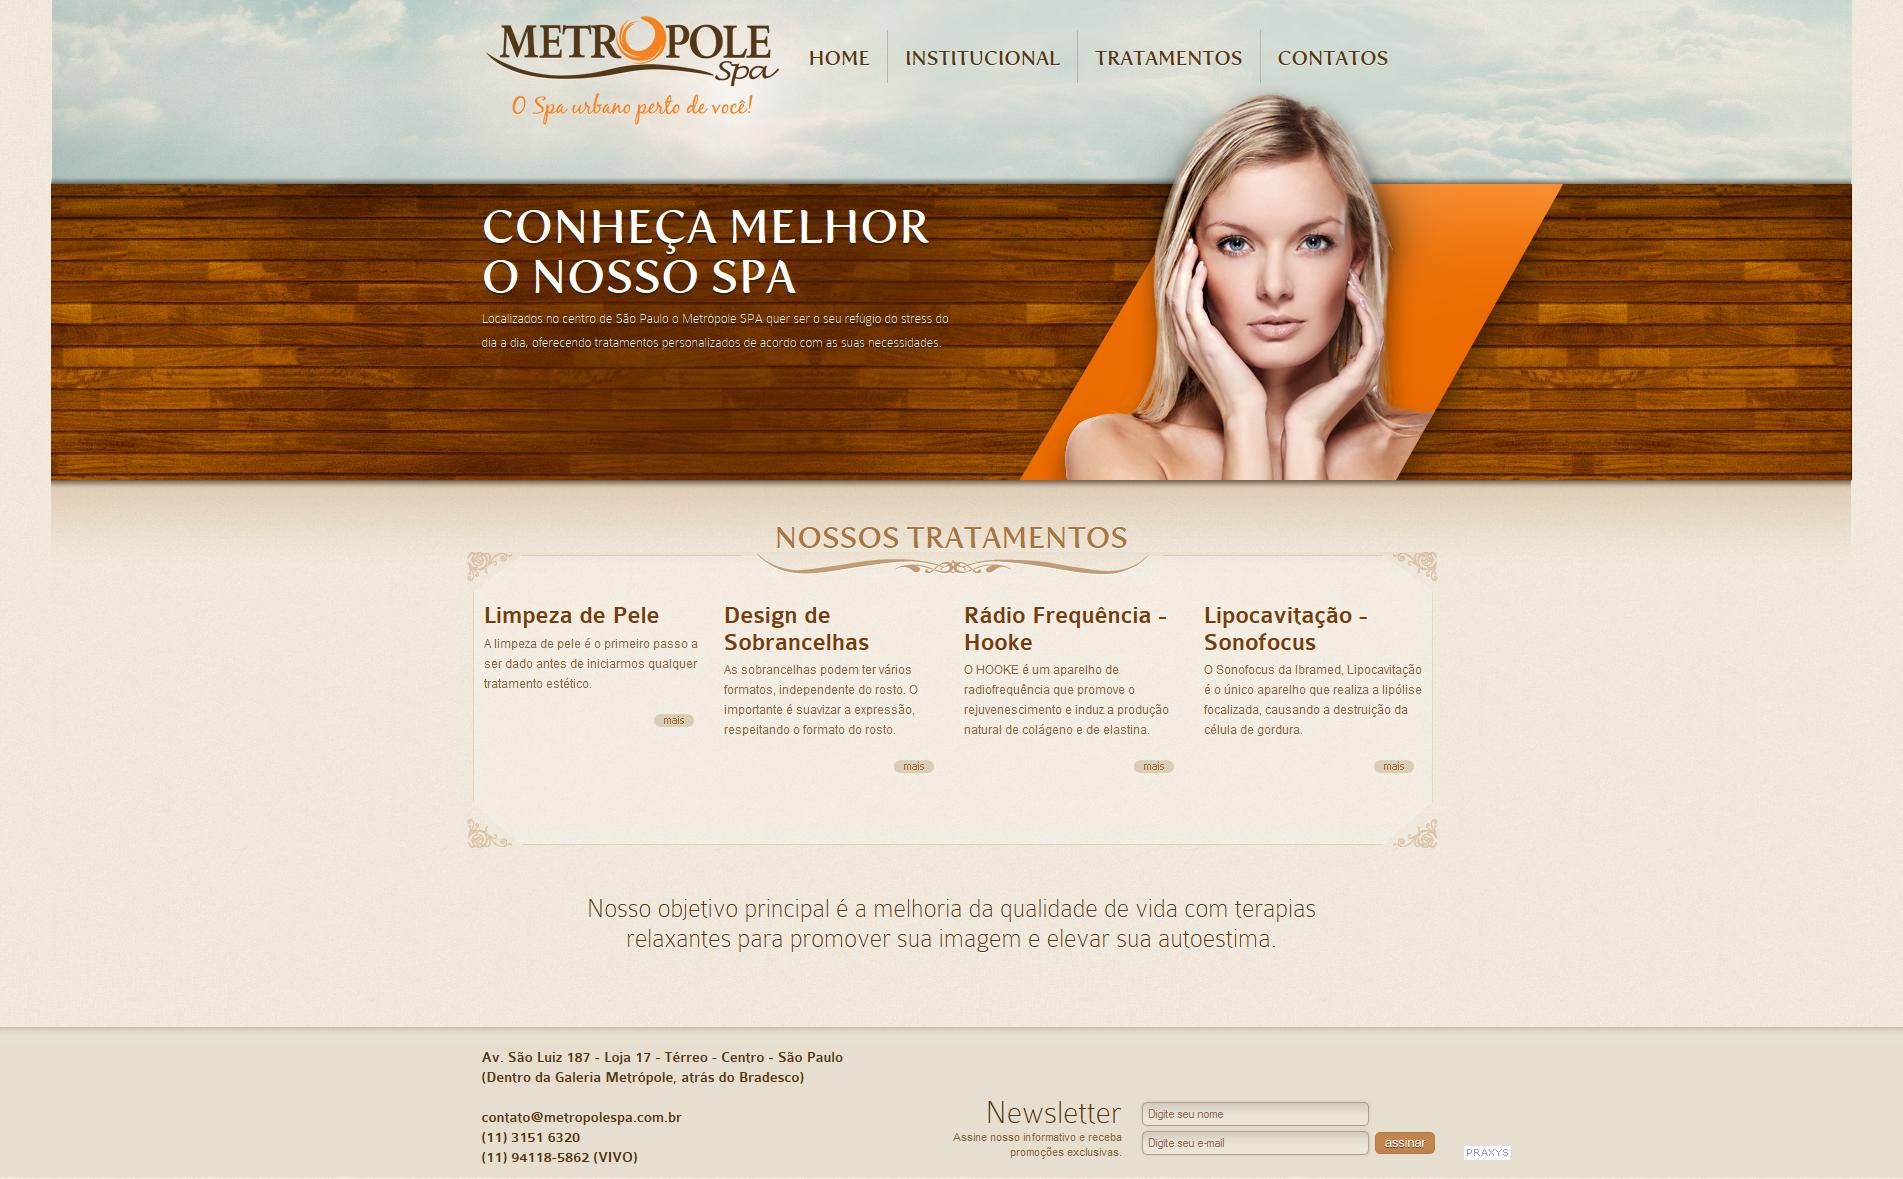 Imagem do projeto Metropole Spa